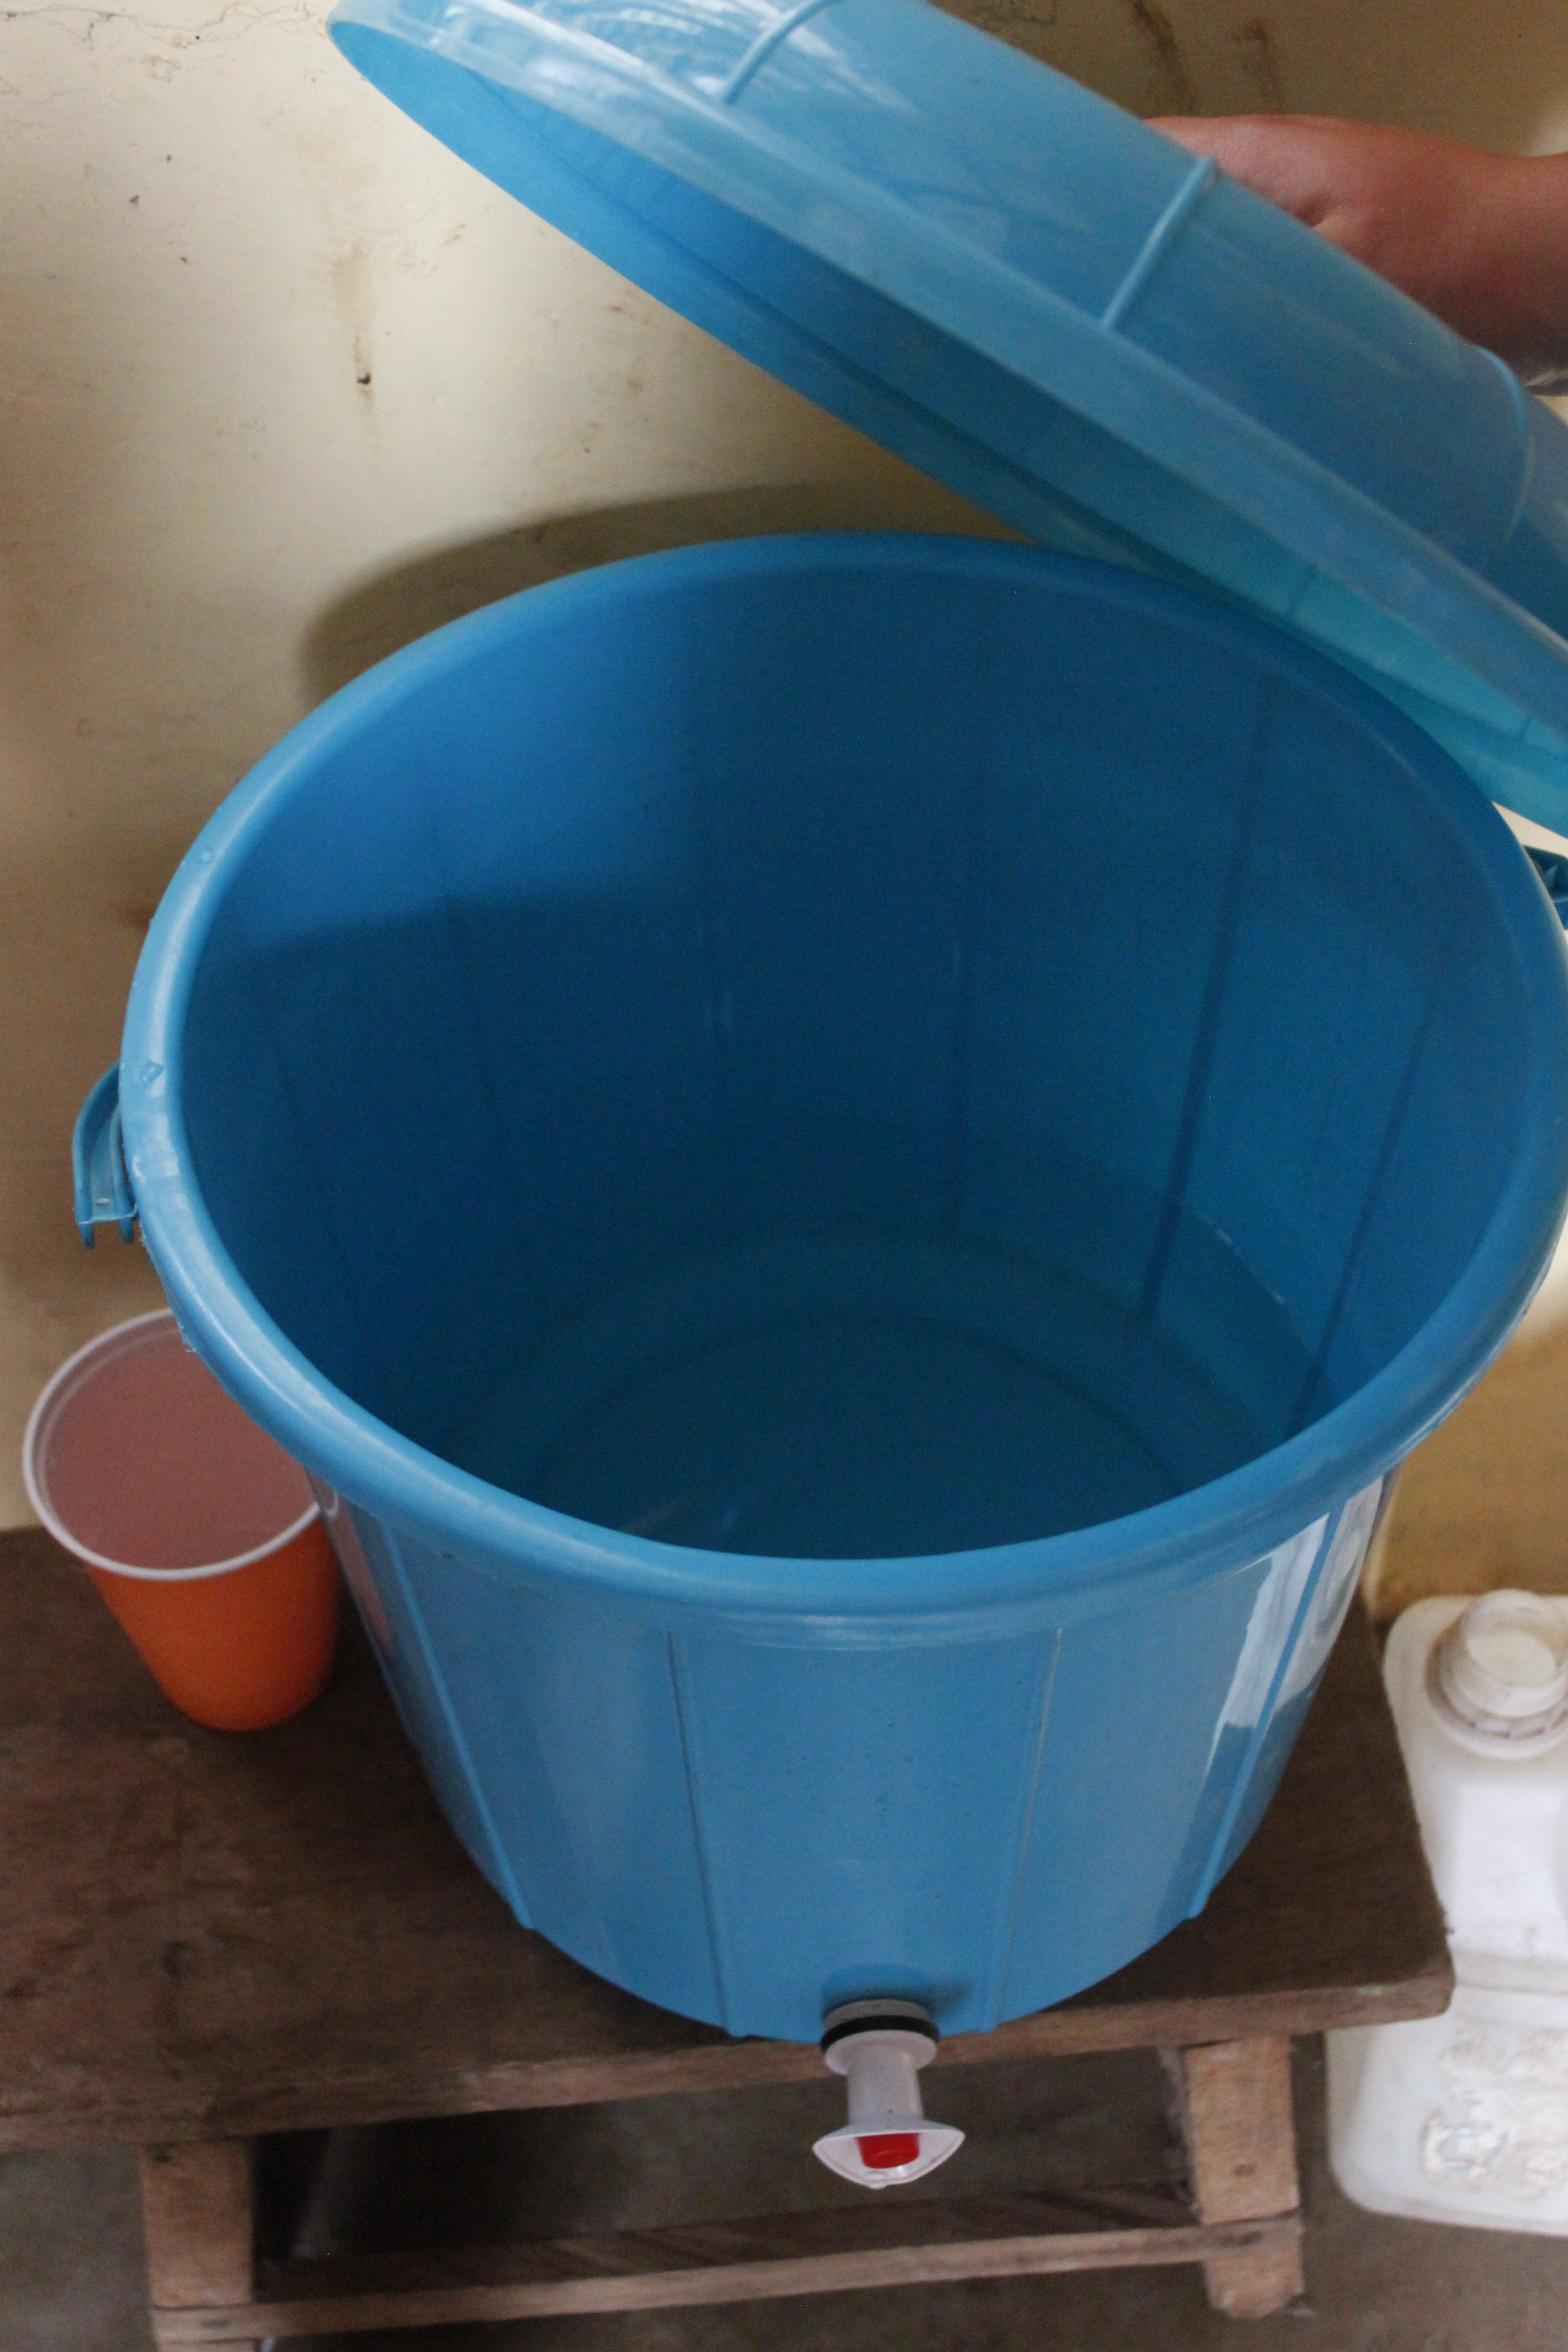 Clean water!